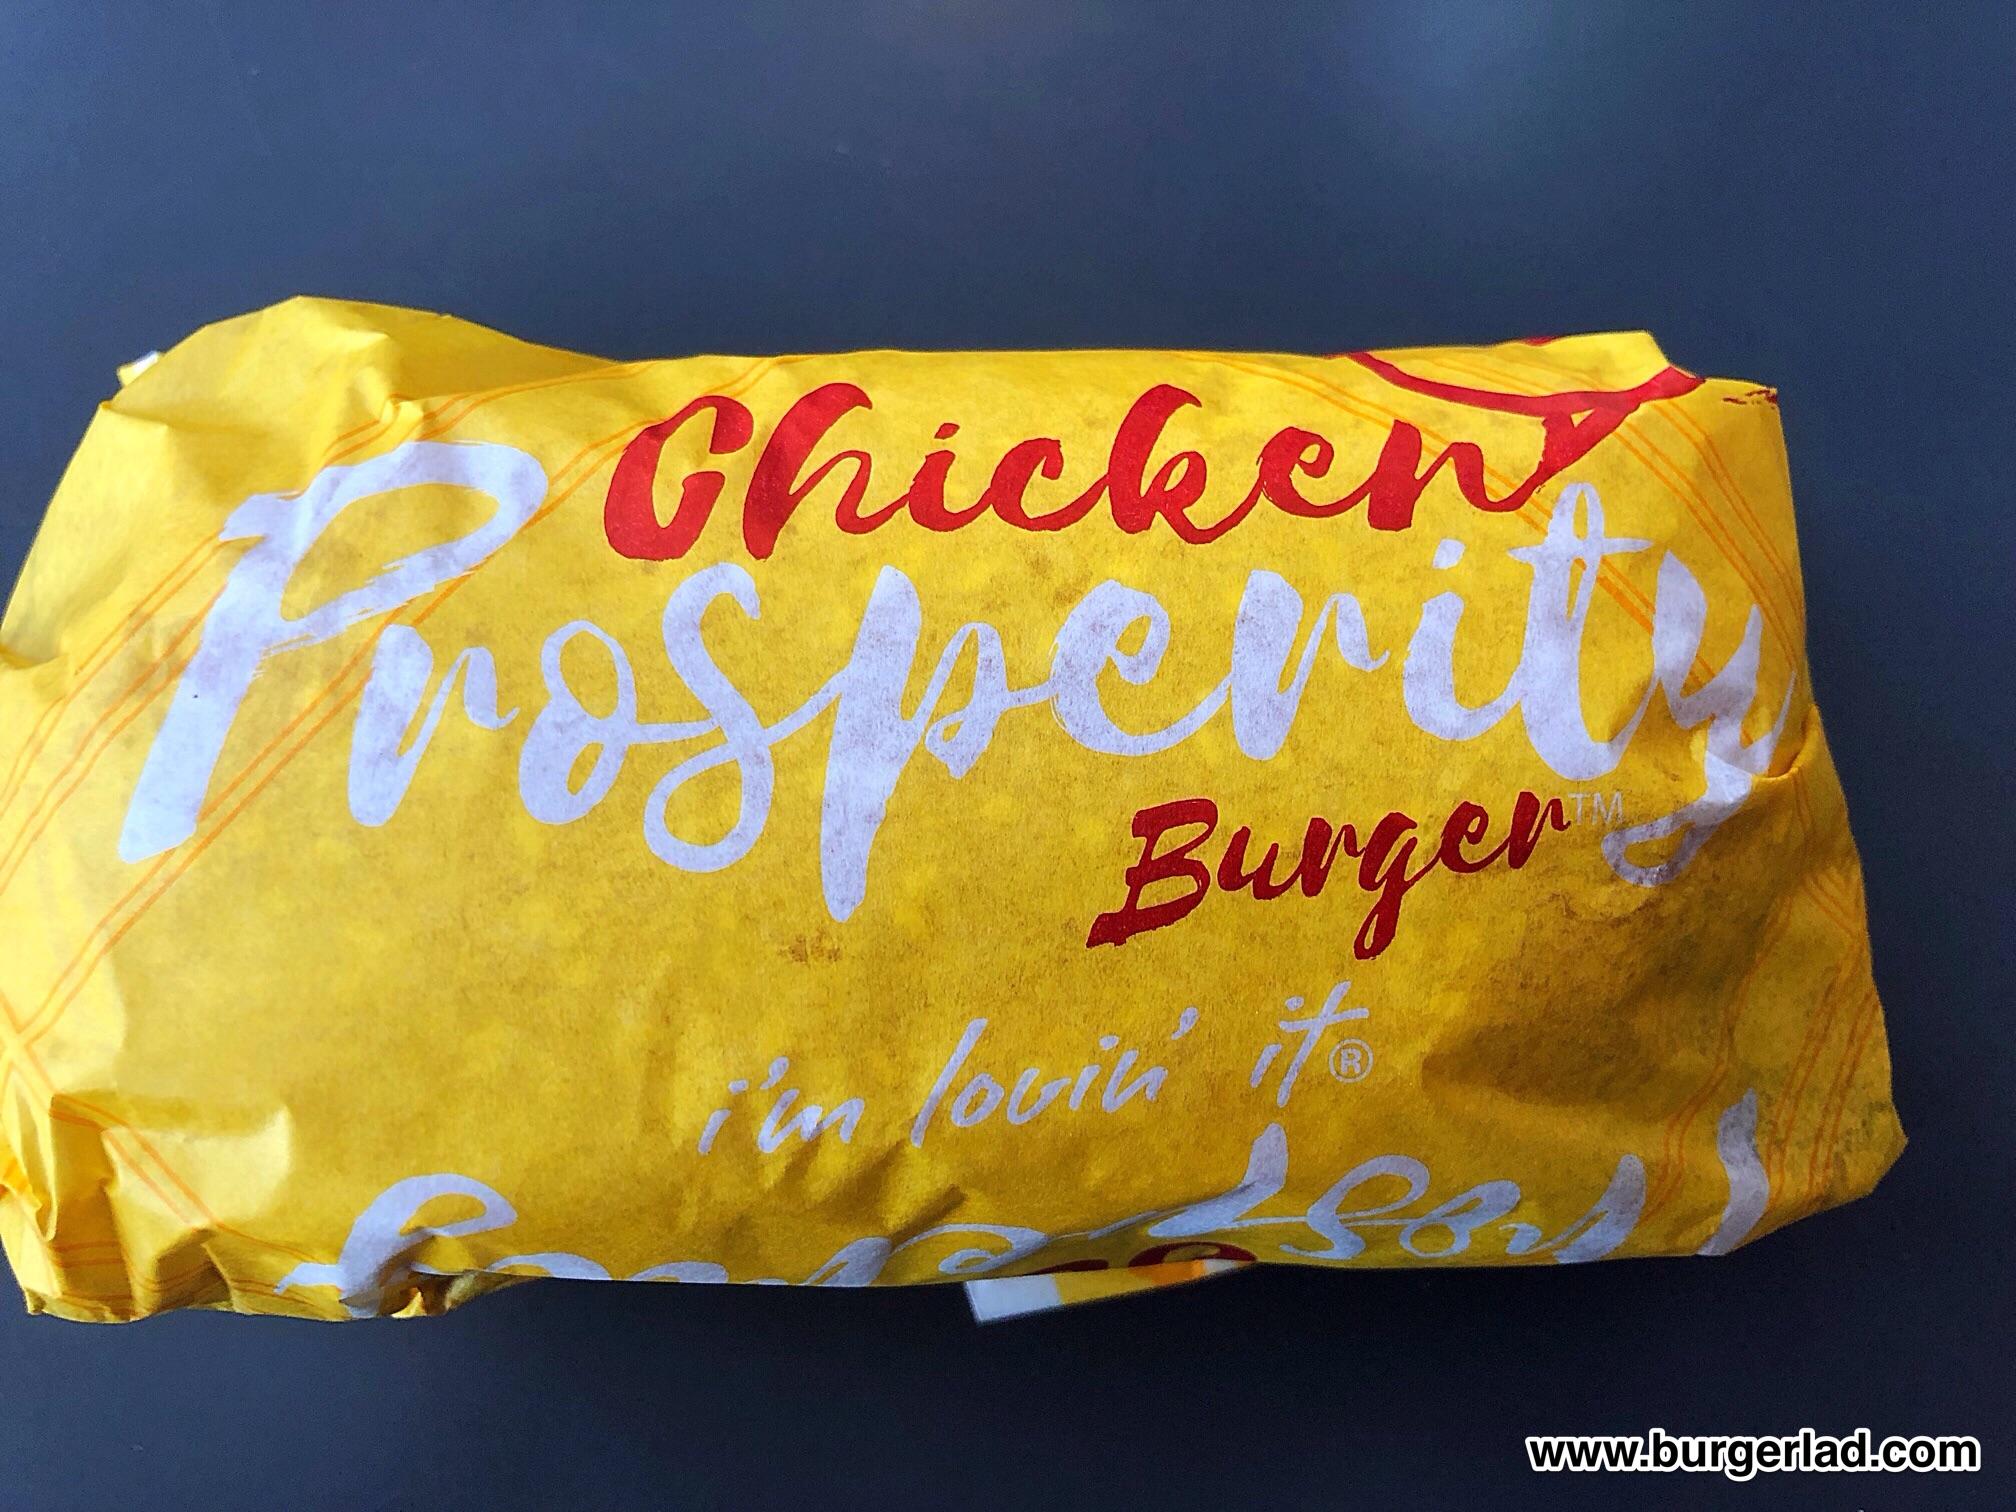 McDonald's Prosperity Burger - Chicken